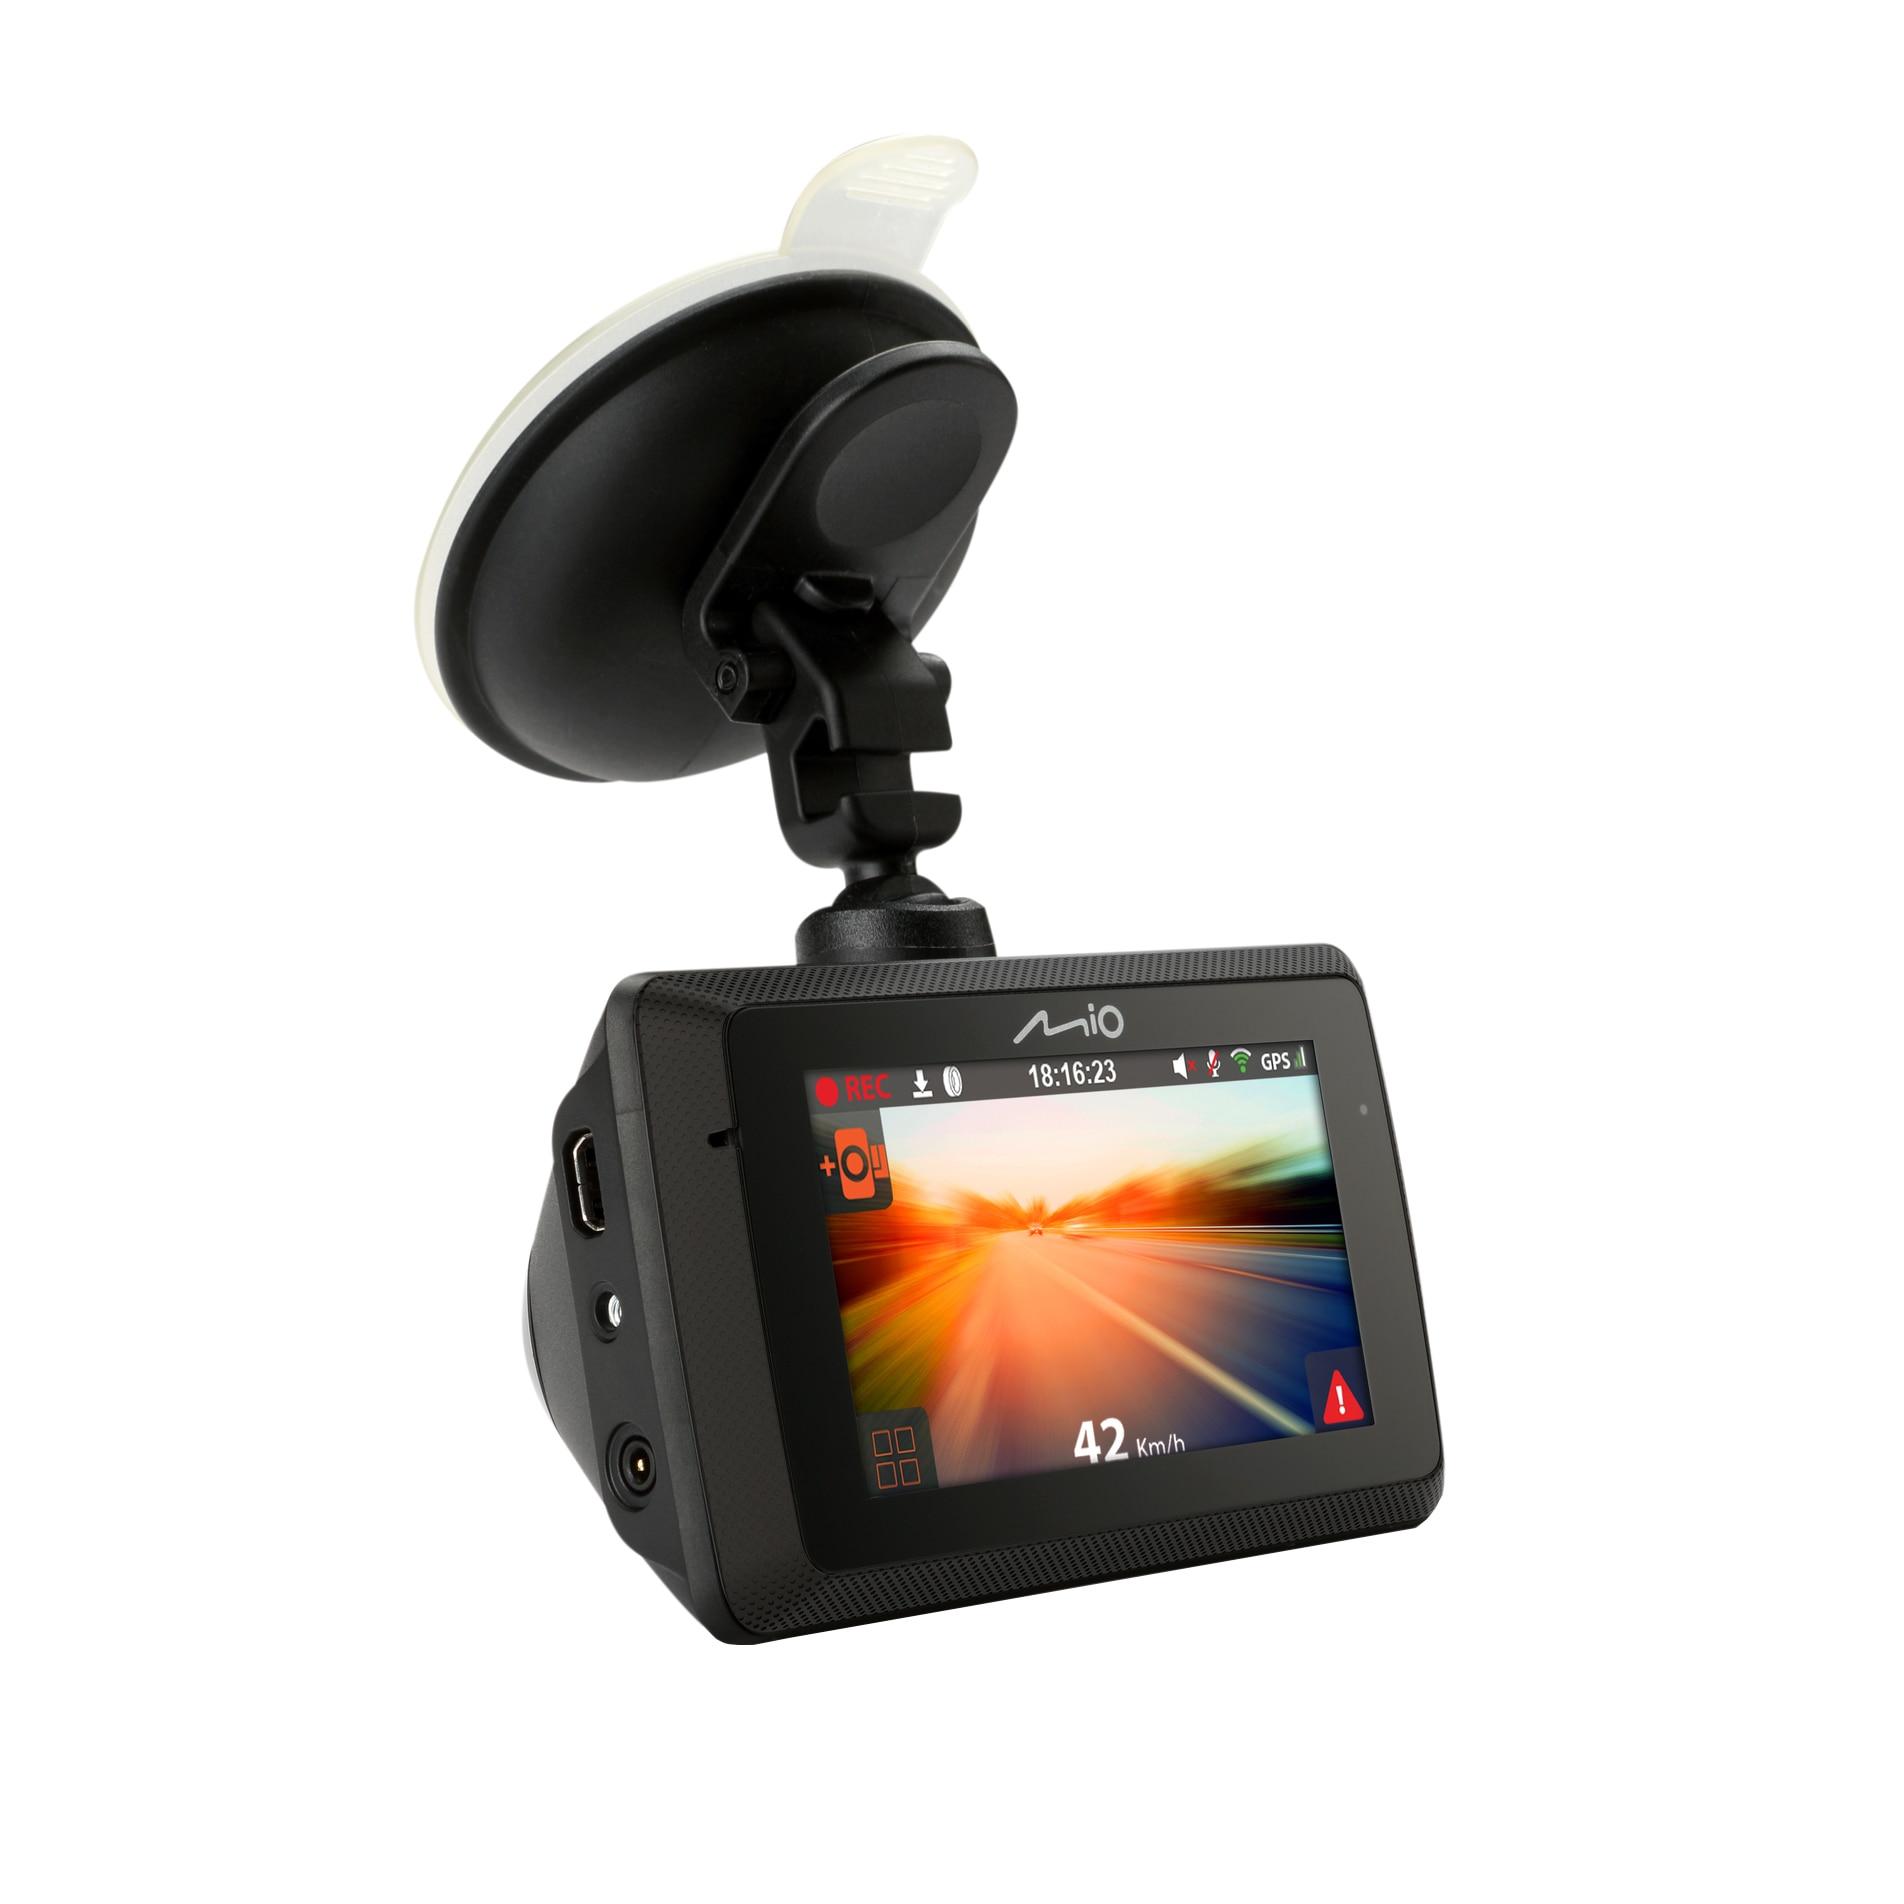 "Fotografie Camera auto Mio MiVue 788 Connect, 2.7 "", Bluetooth, Full HD"